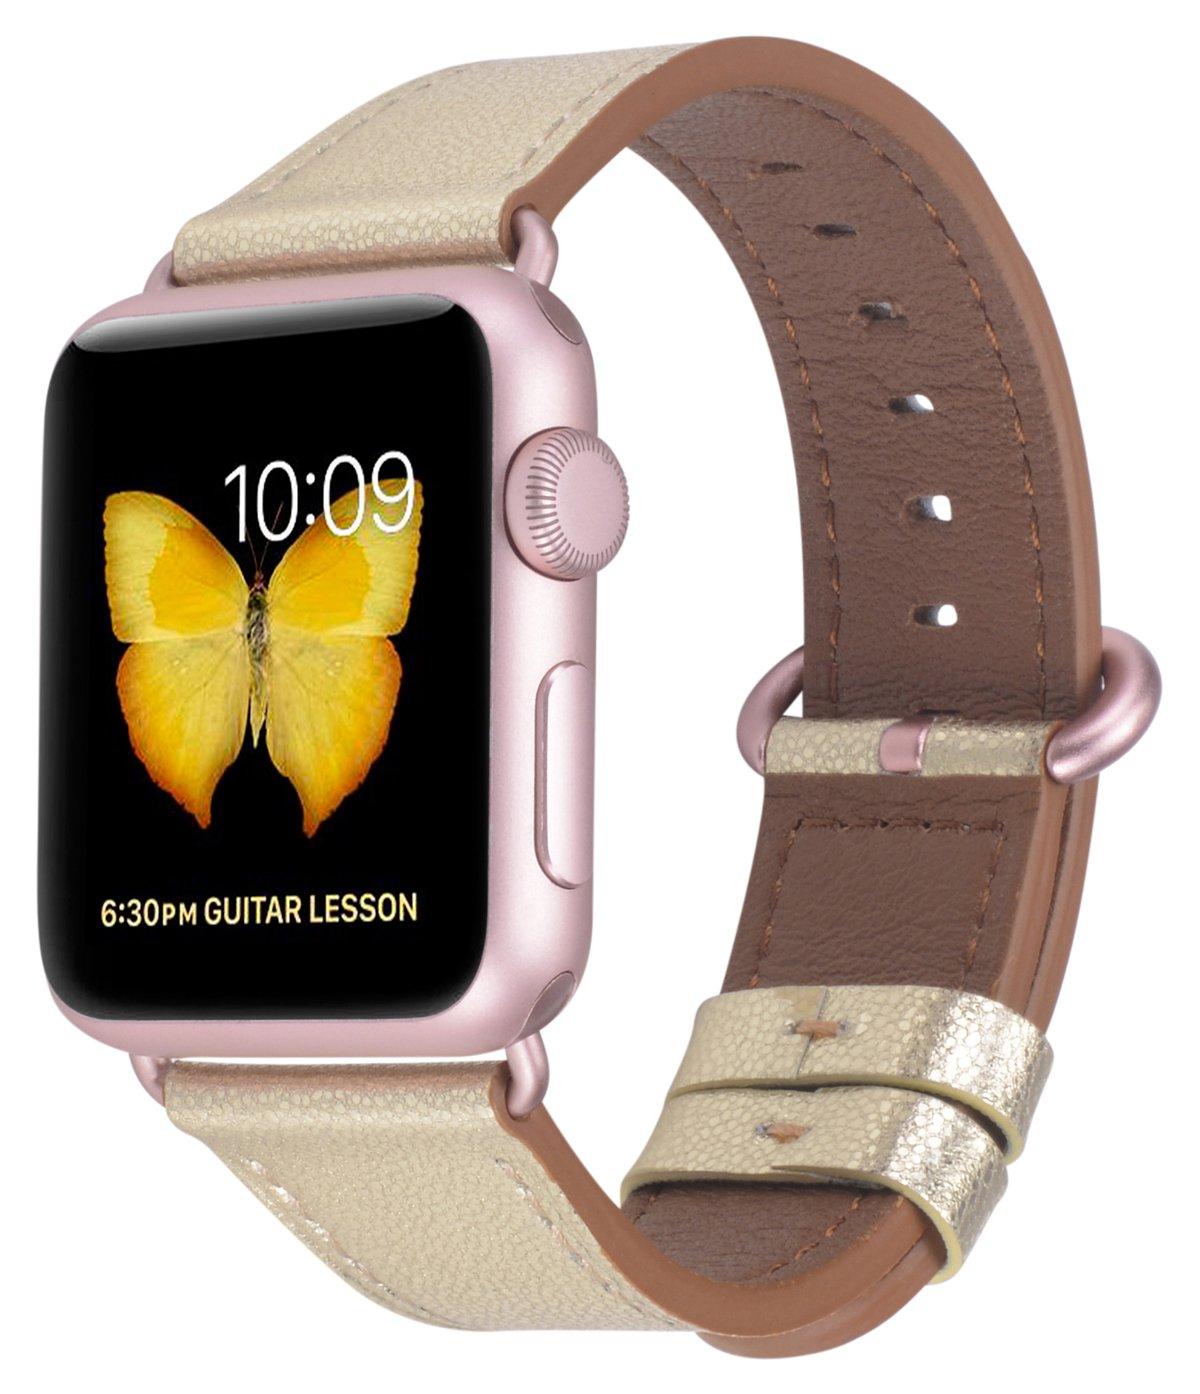 Malla Cuero para Apple Watch (38/40mm) PEAK ZHANG [7KZGYM3B]